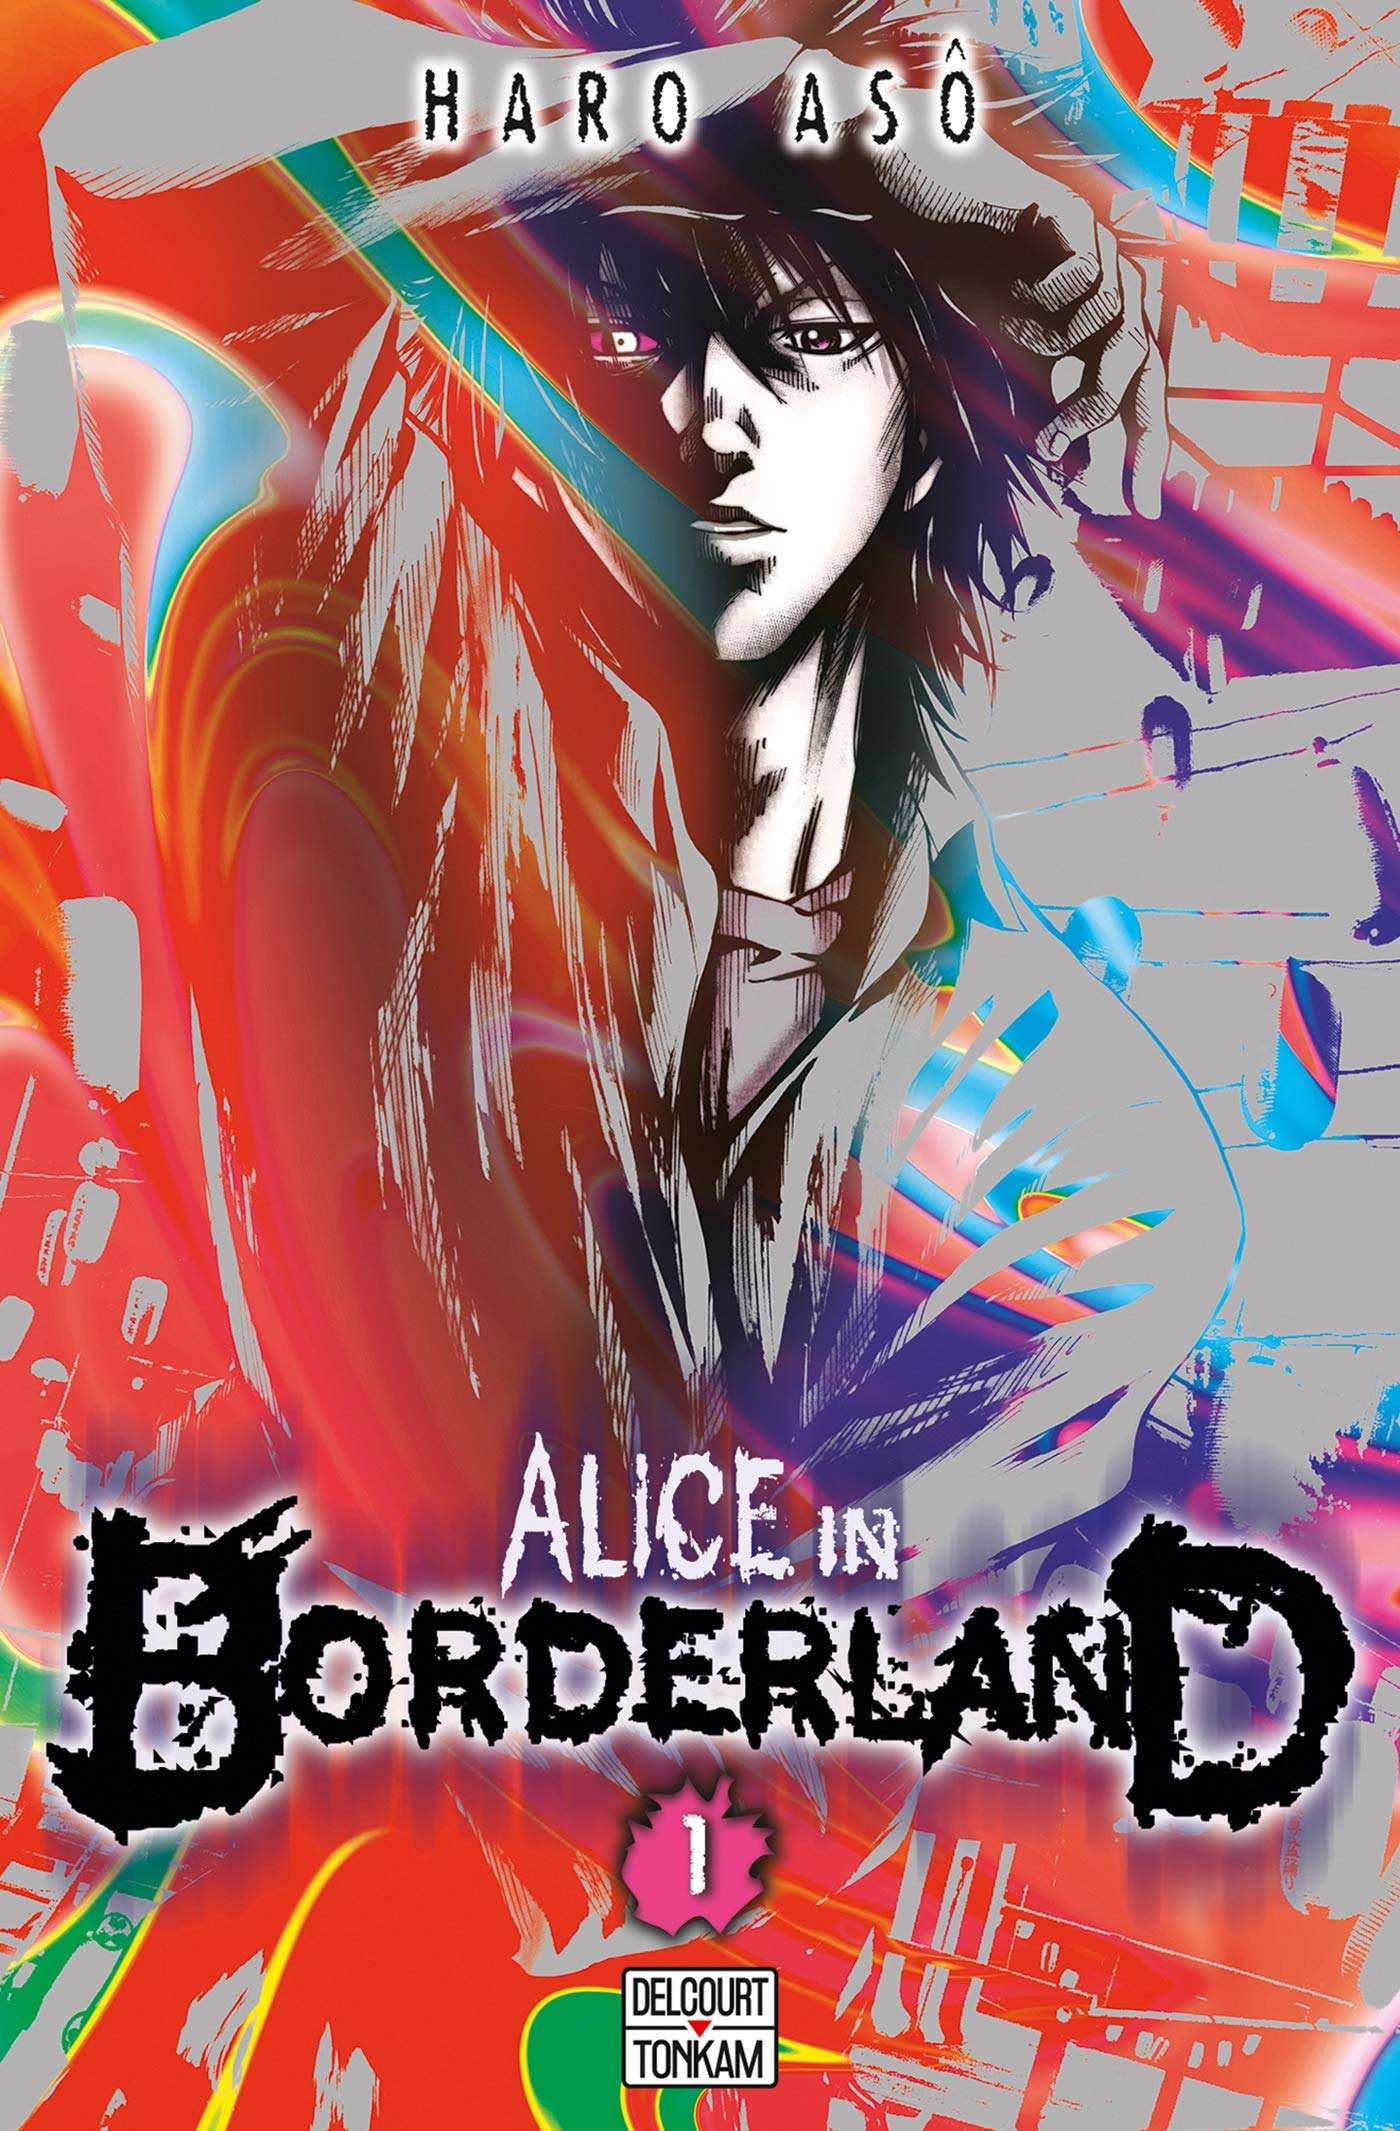 Alice in Borderland T01 (Manga (Také)) (French Edition): Asô, Haro: 9782756037035: Amazon.com: Books